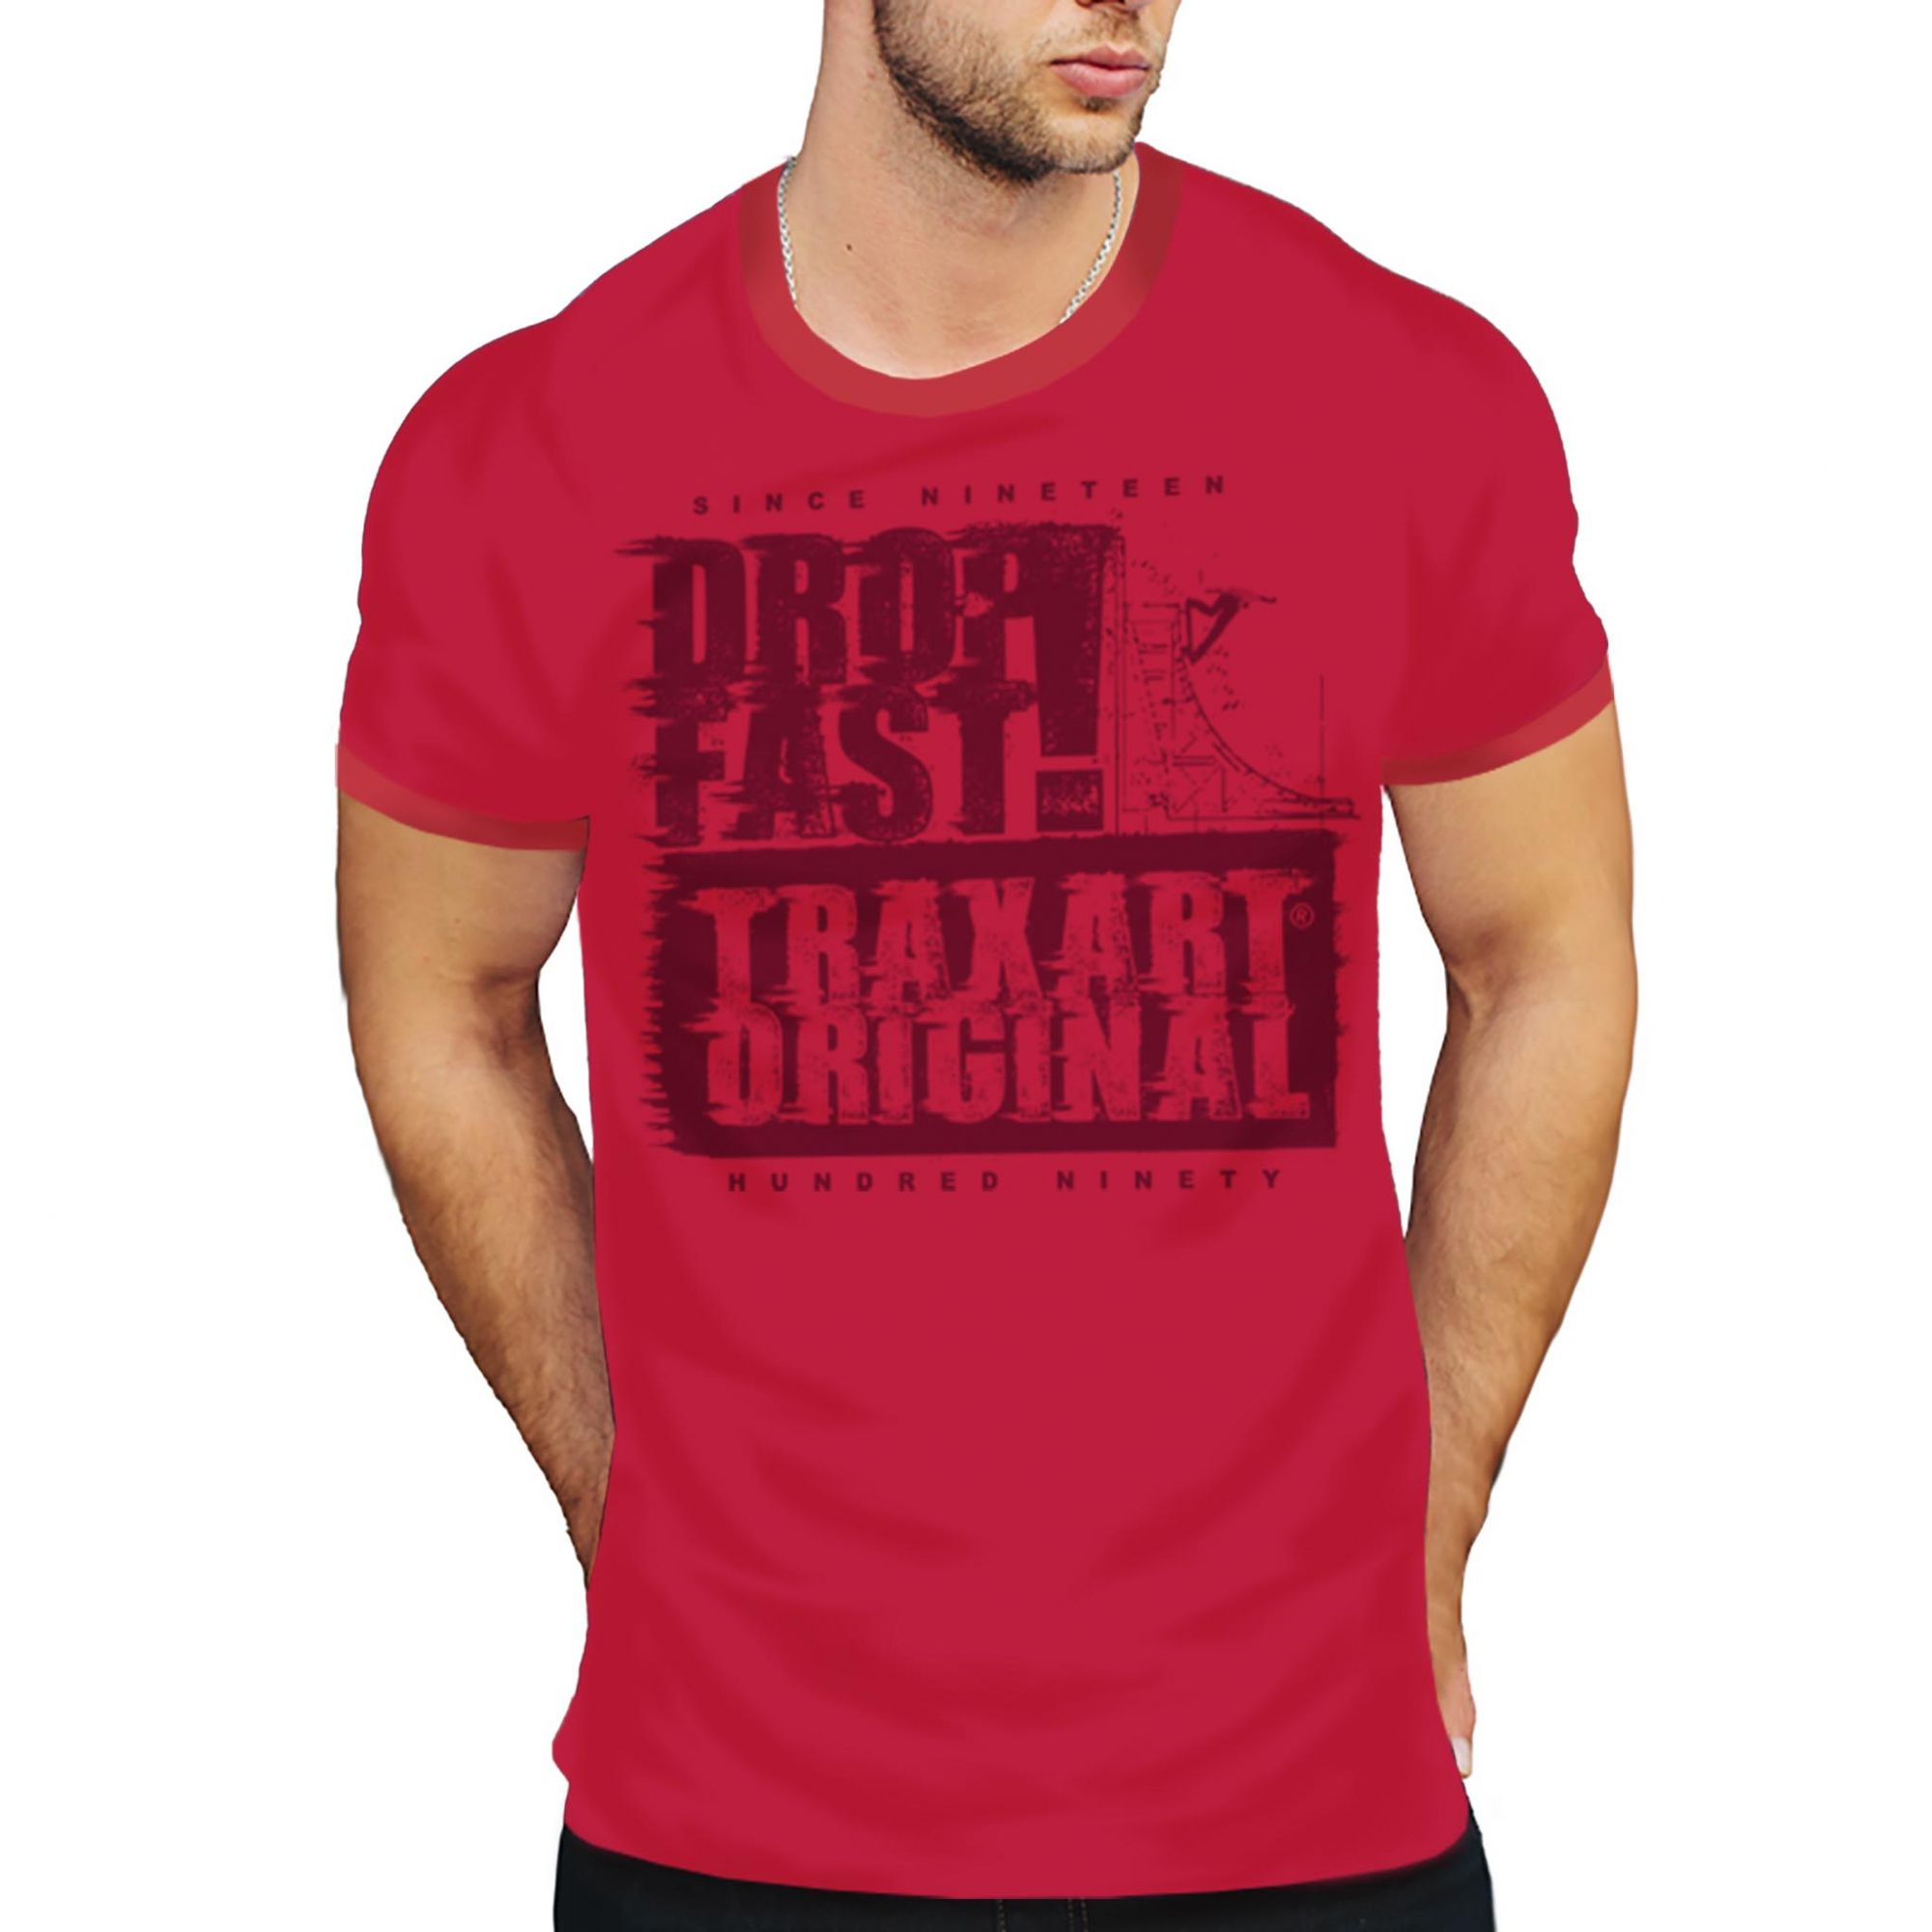 Camiseta Traxart Tradicional Drop Fast - DW-143